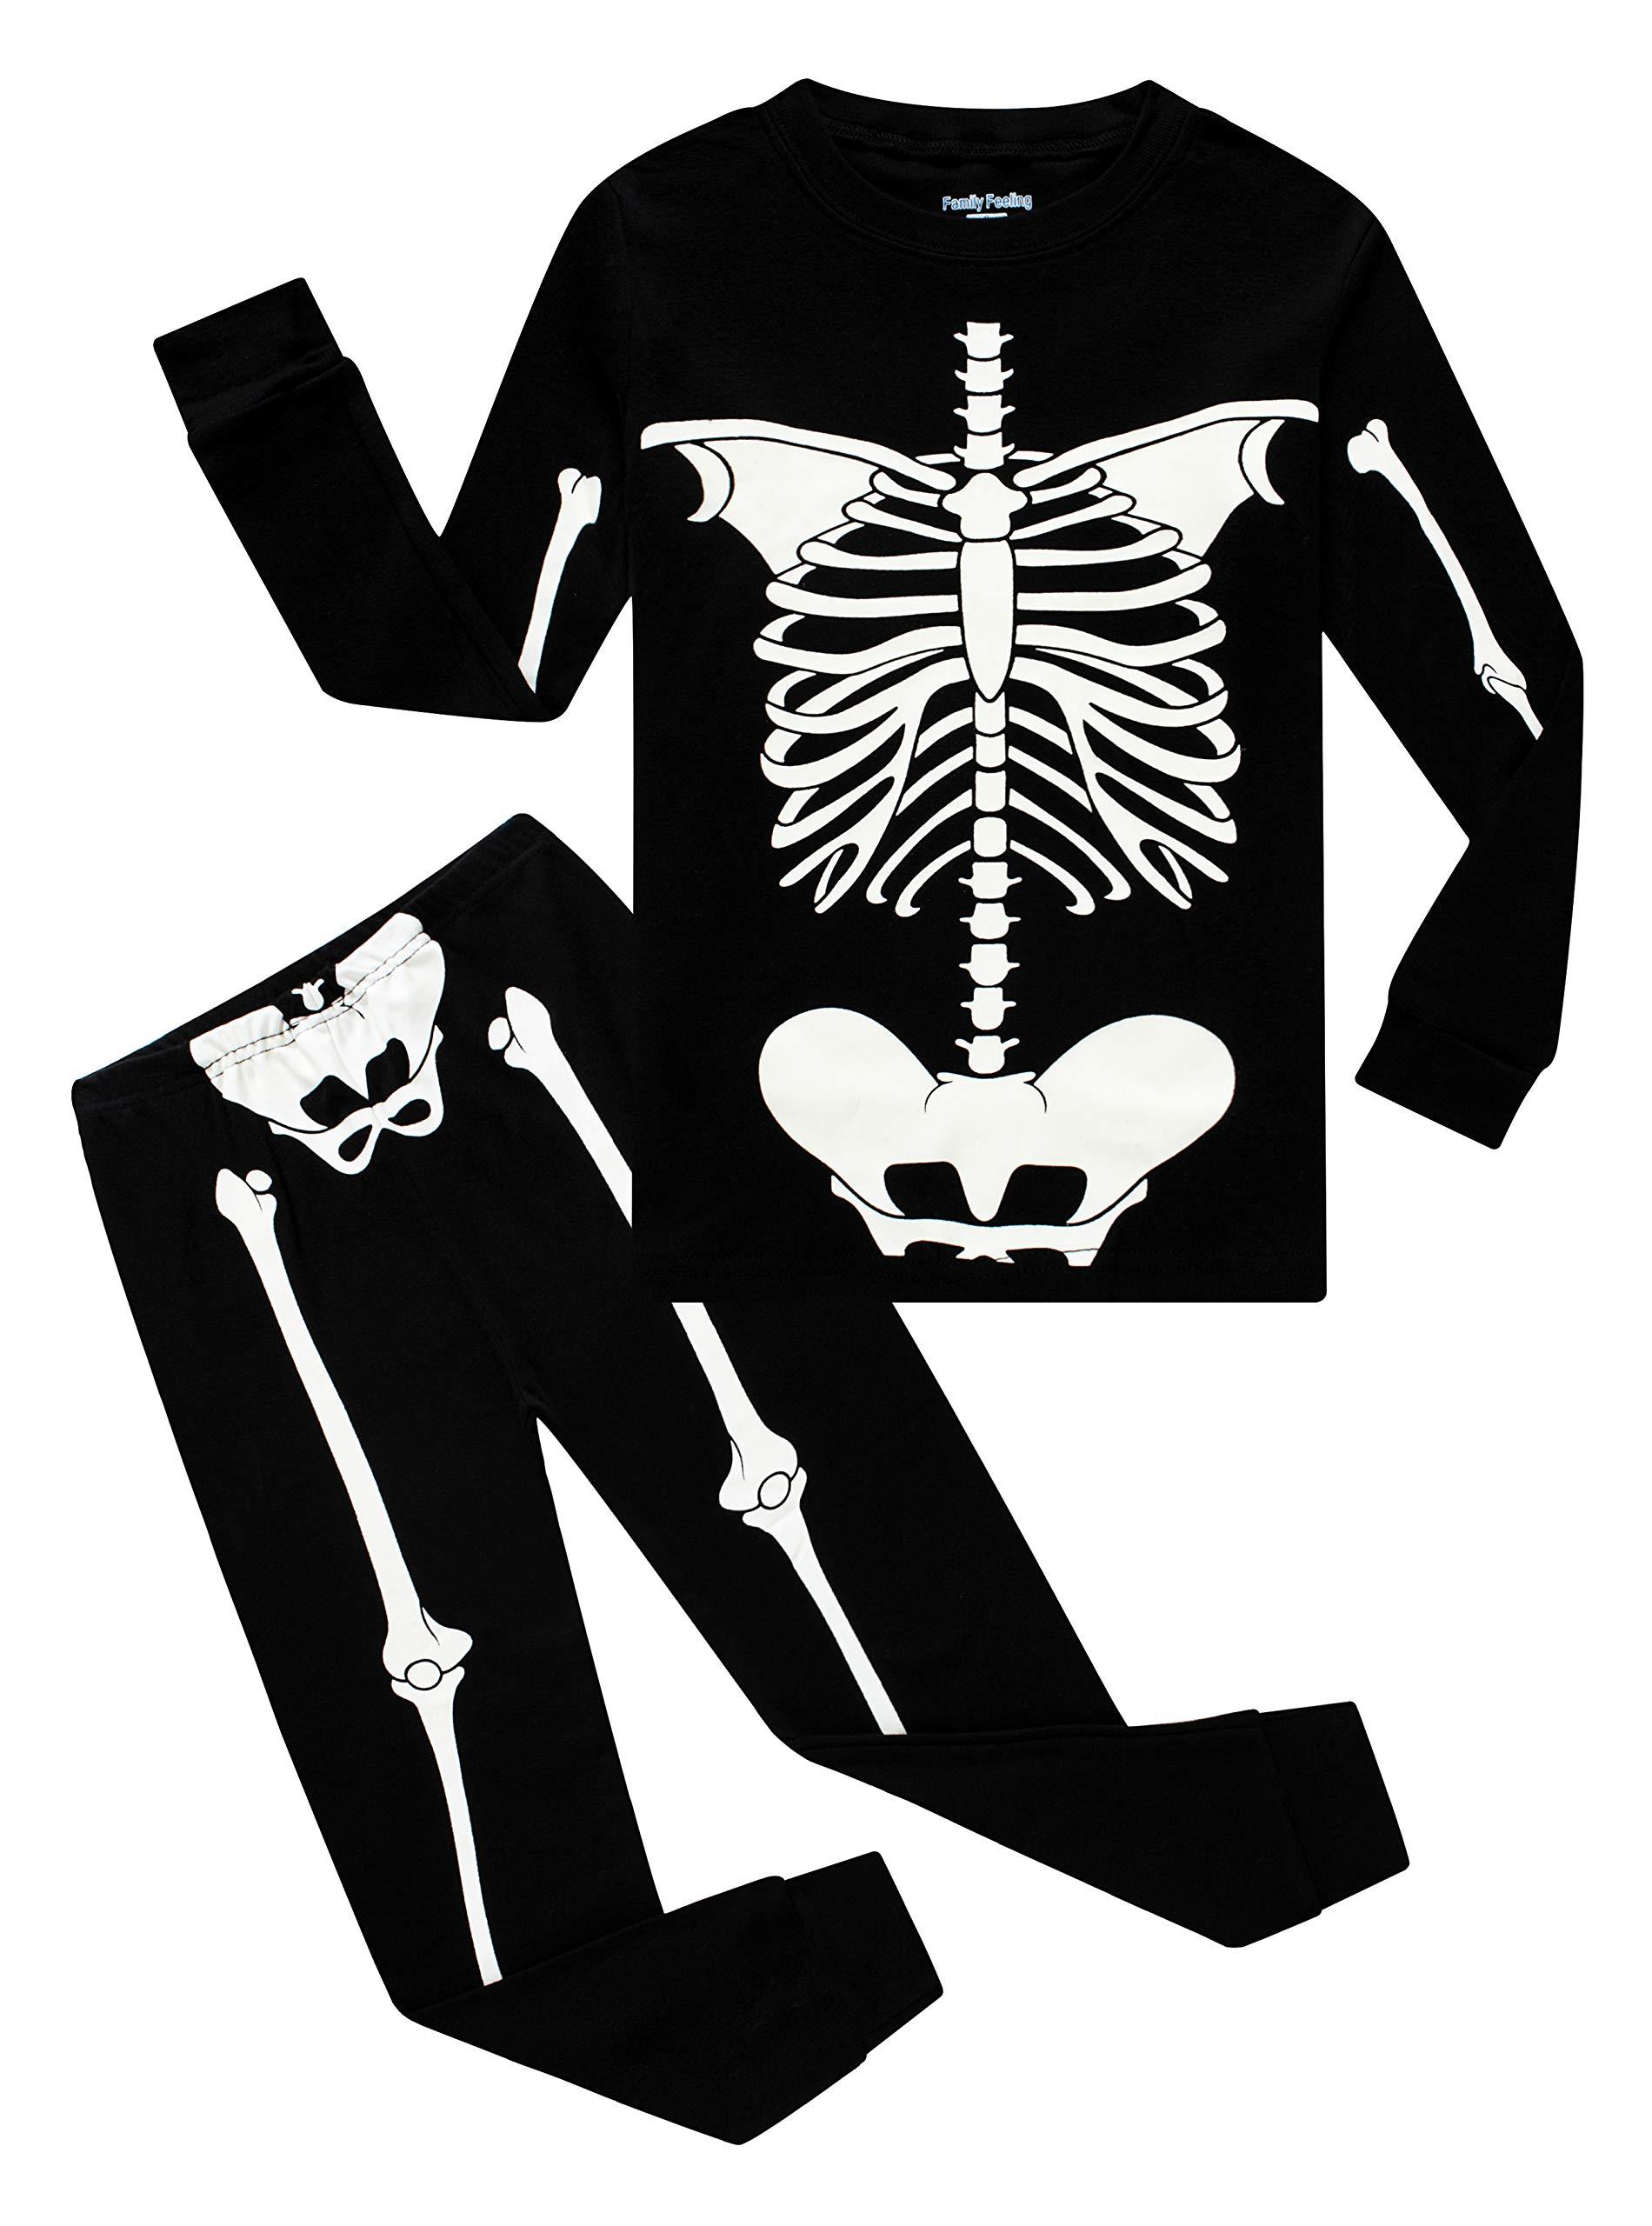 Skeleton Halloween Clothes Pajamas Big Boys Girls Glow in The Dark Skeleton Sleepwear Long Sleeve Kids Pjs Size 14 by Family Feeling